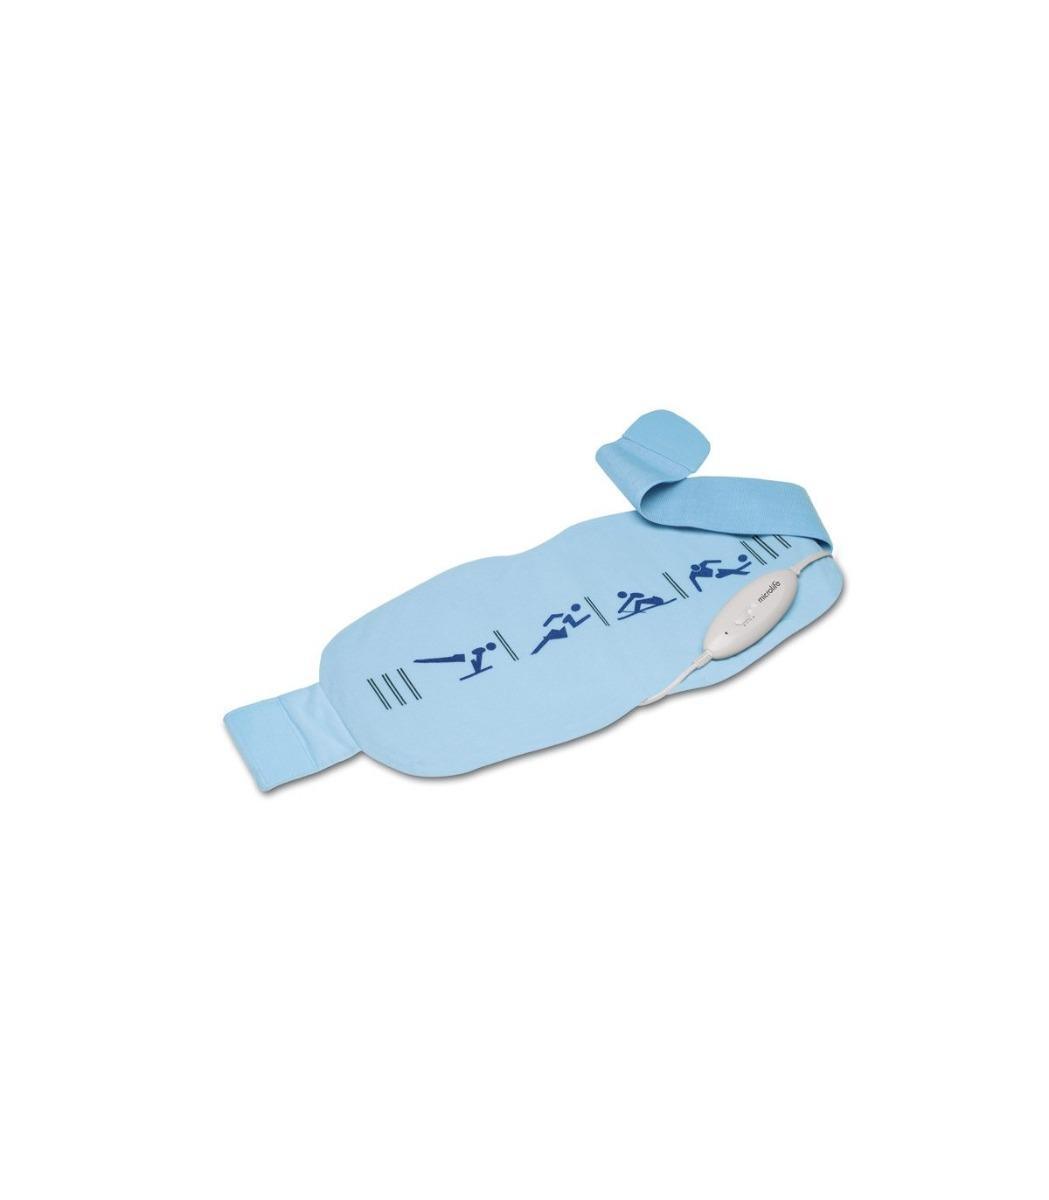 Perna electrica FH 310, 1 bucata, Microlife imagine 2021 drmax.ro